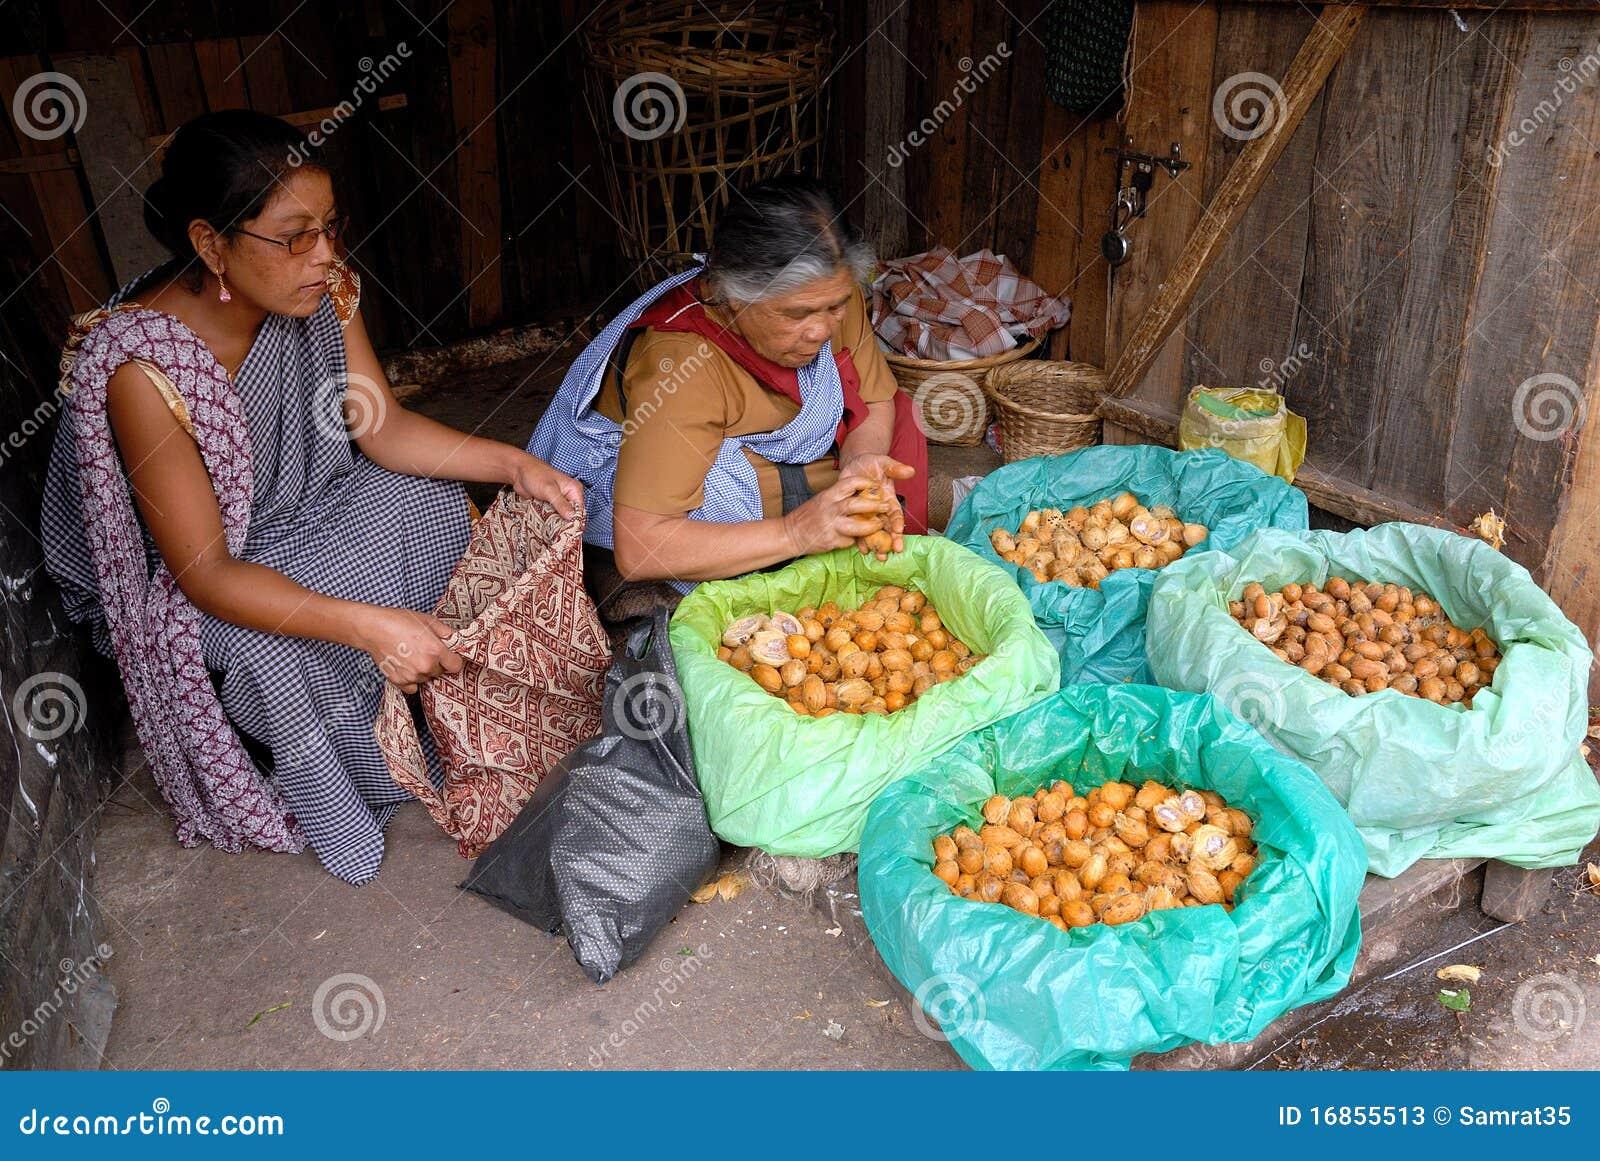 Mercado indiano